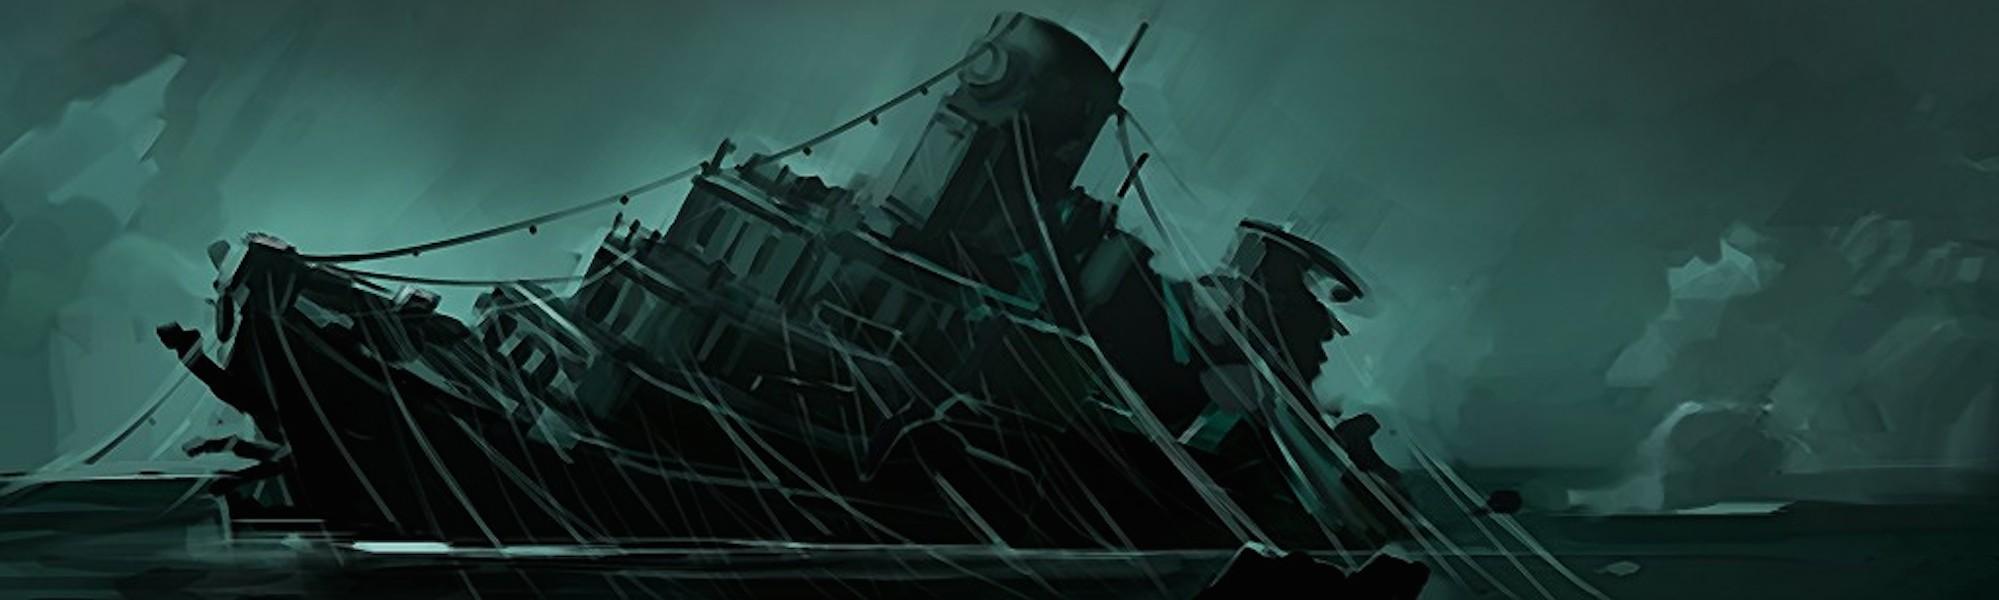 The Literary Heritage of Sunless Sea - Kill Screen